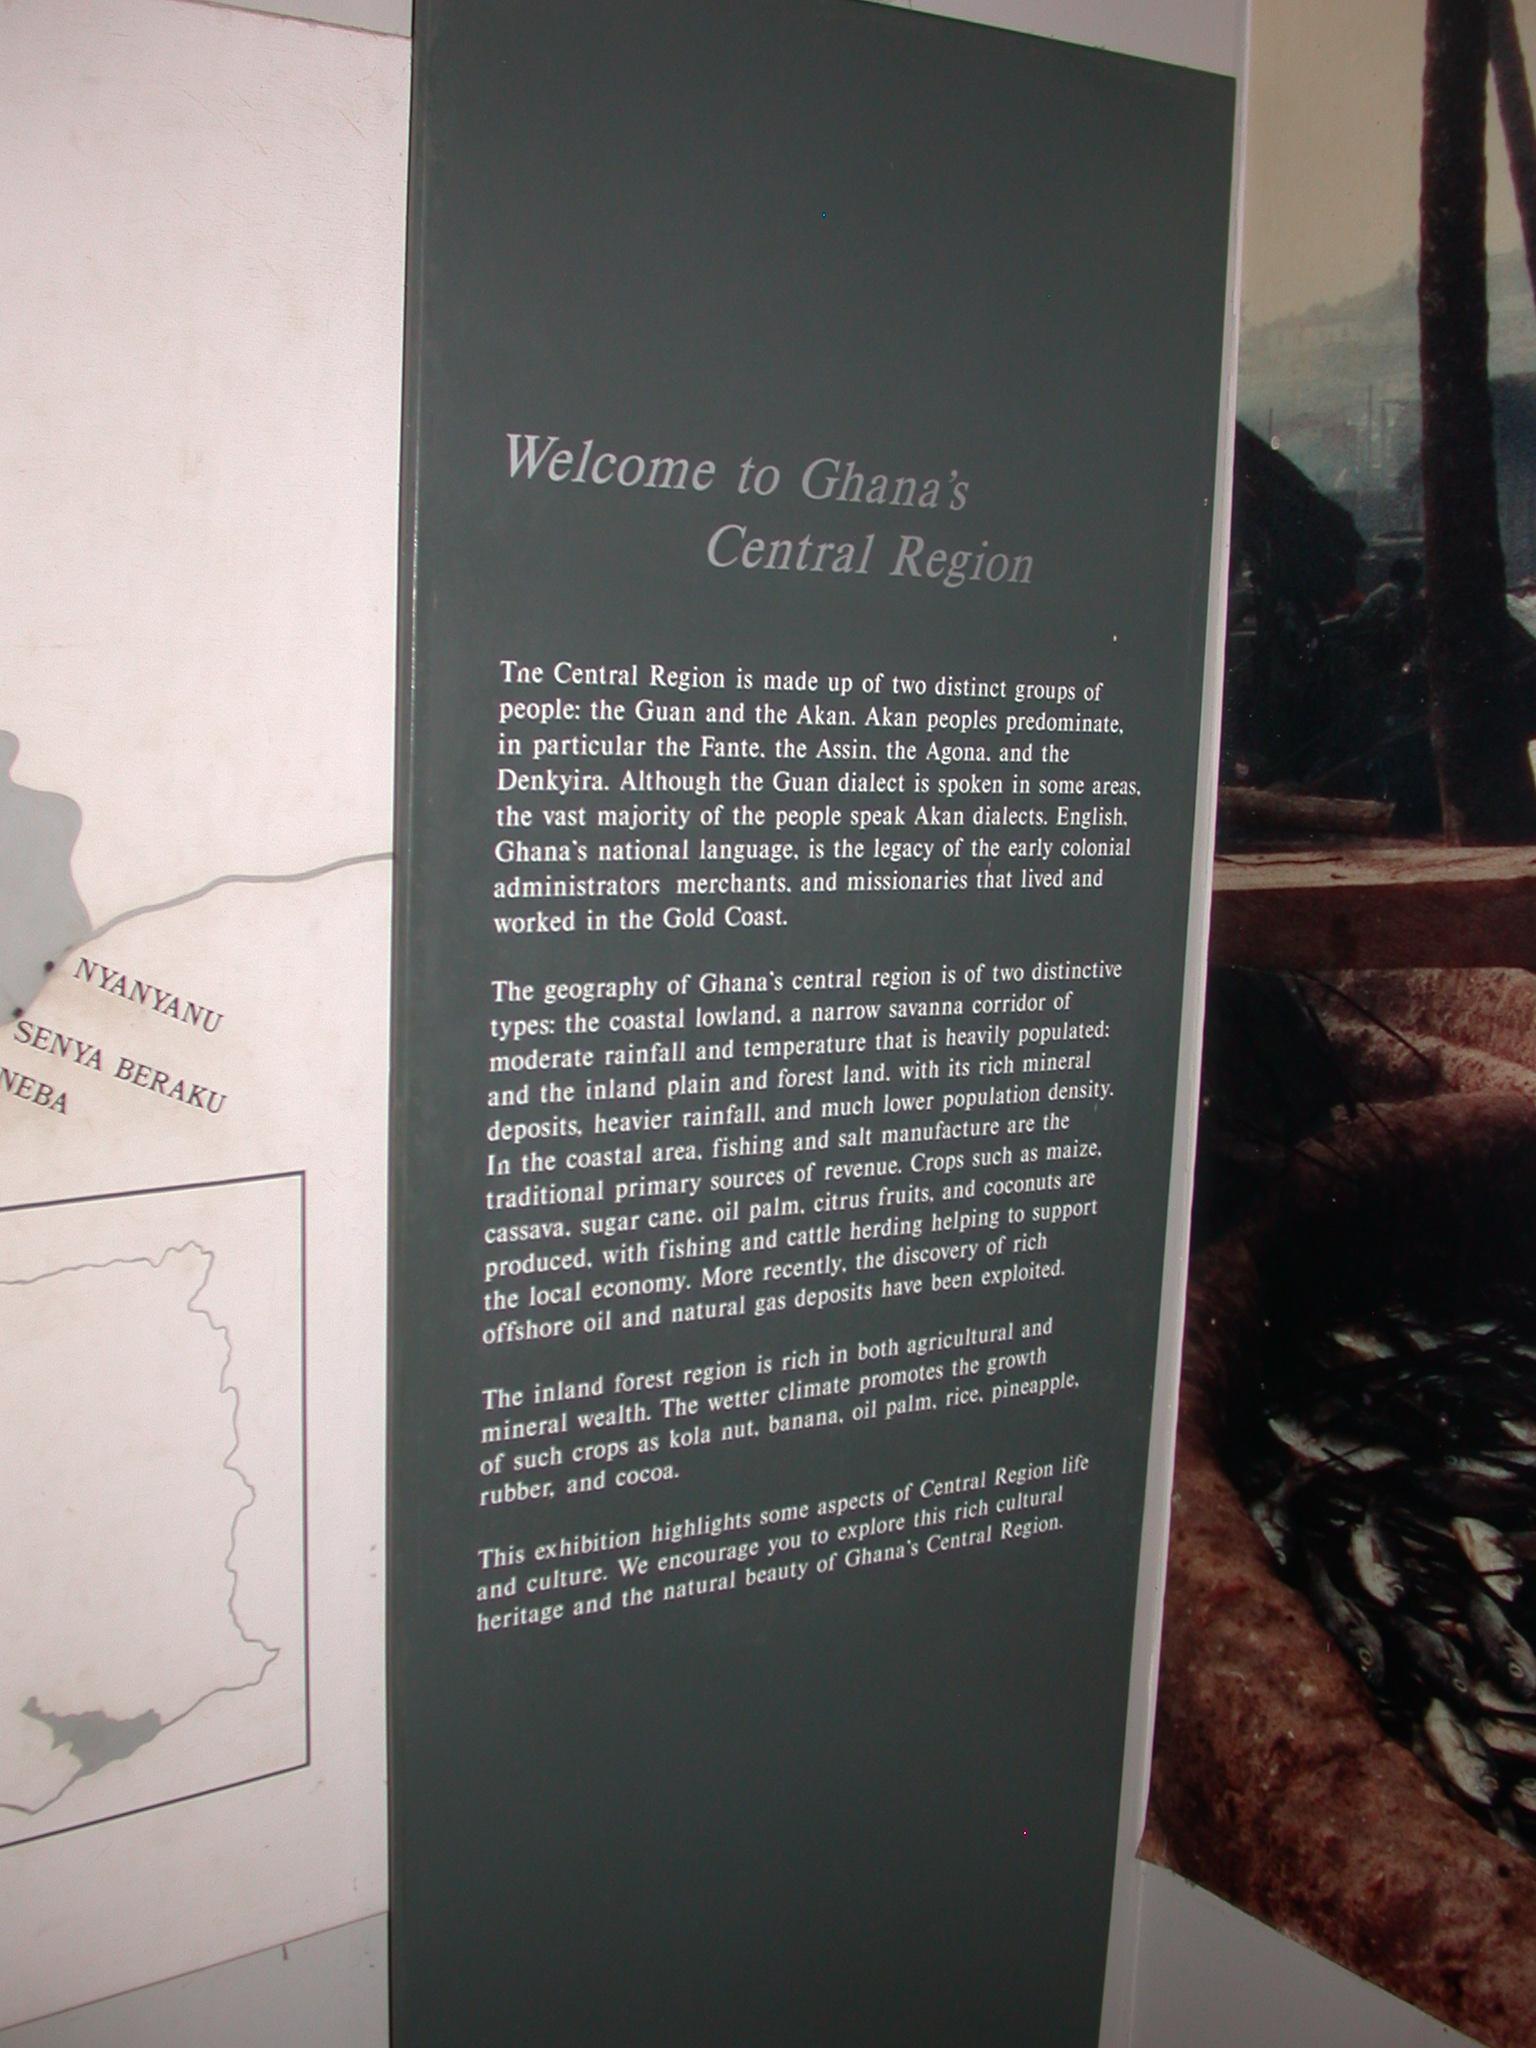 Ghana Central Region Description, Cape Coast Slave Fort Museum, Cape Coast, Ghana